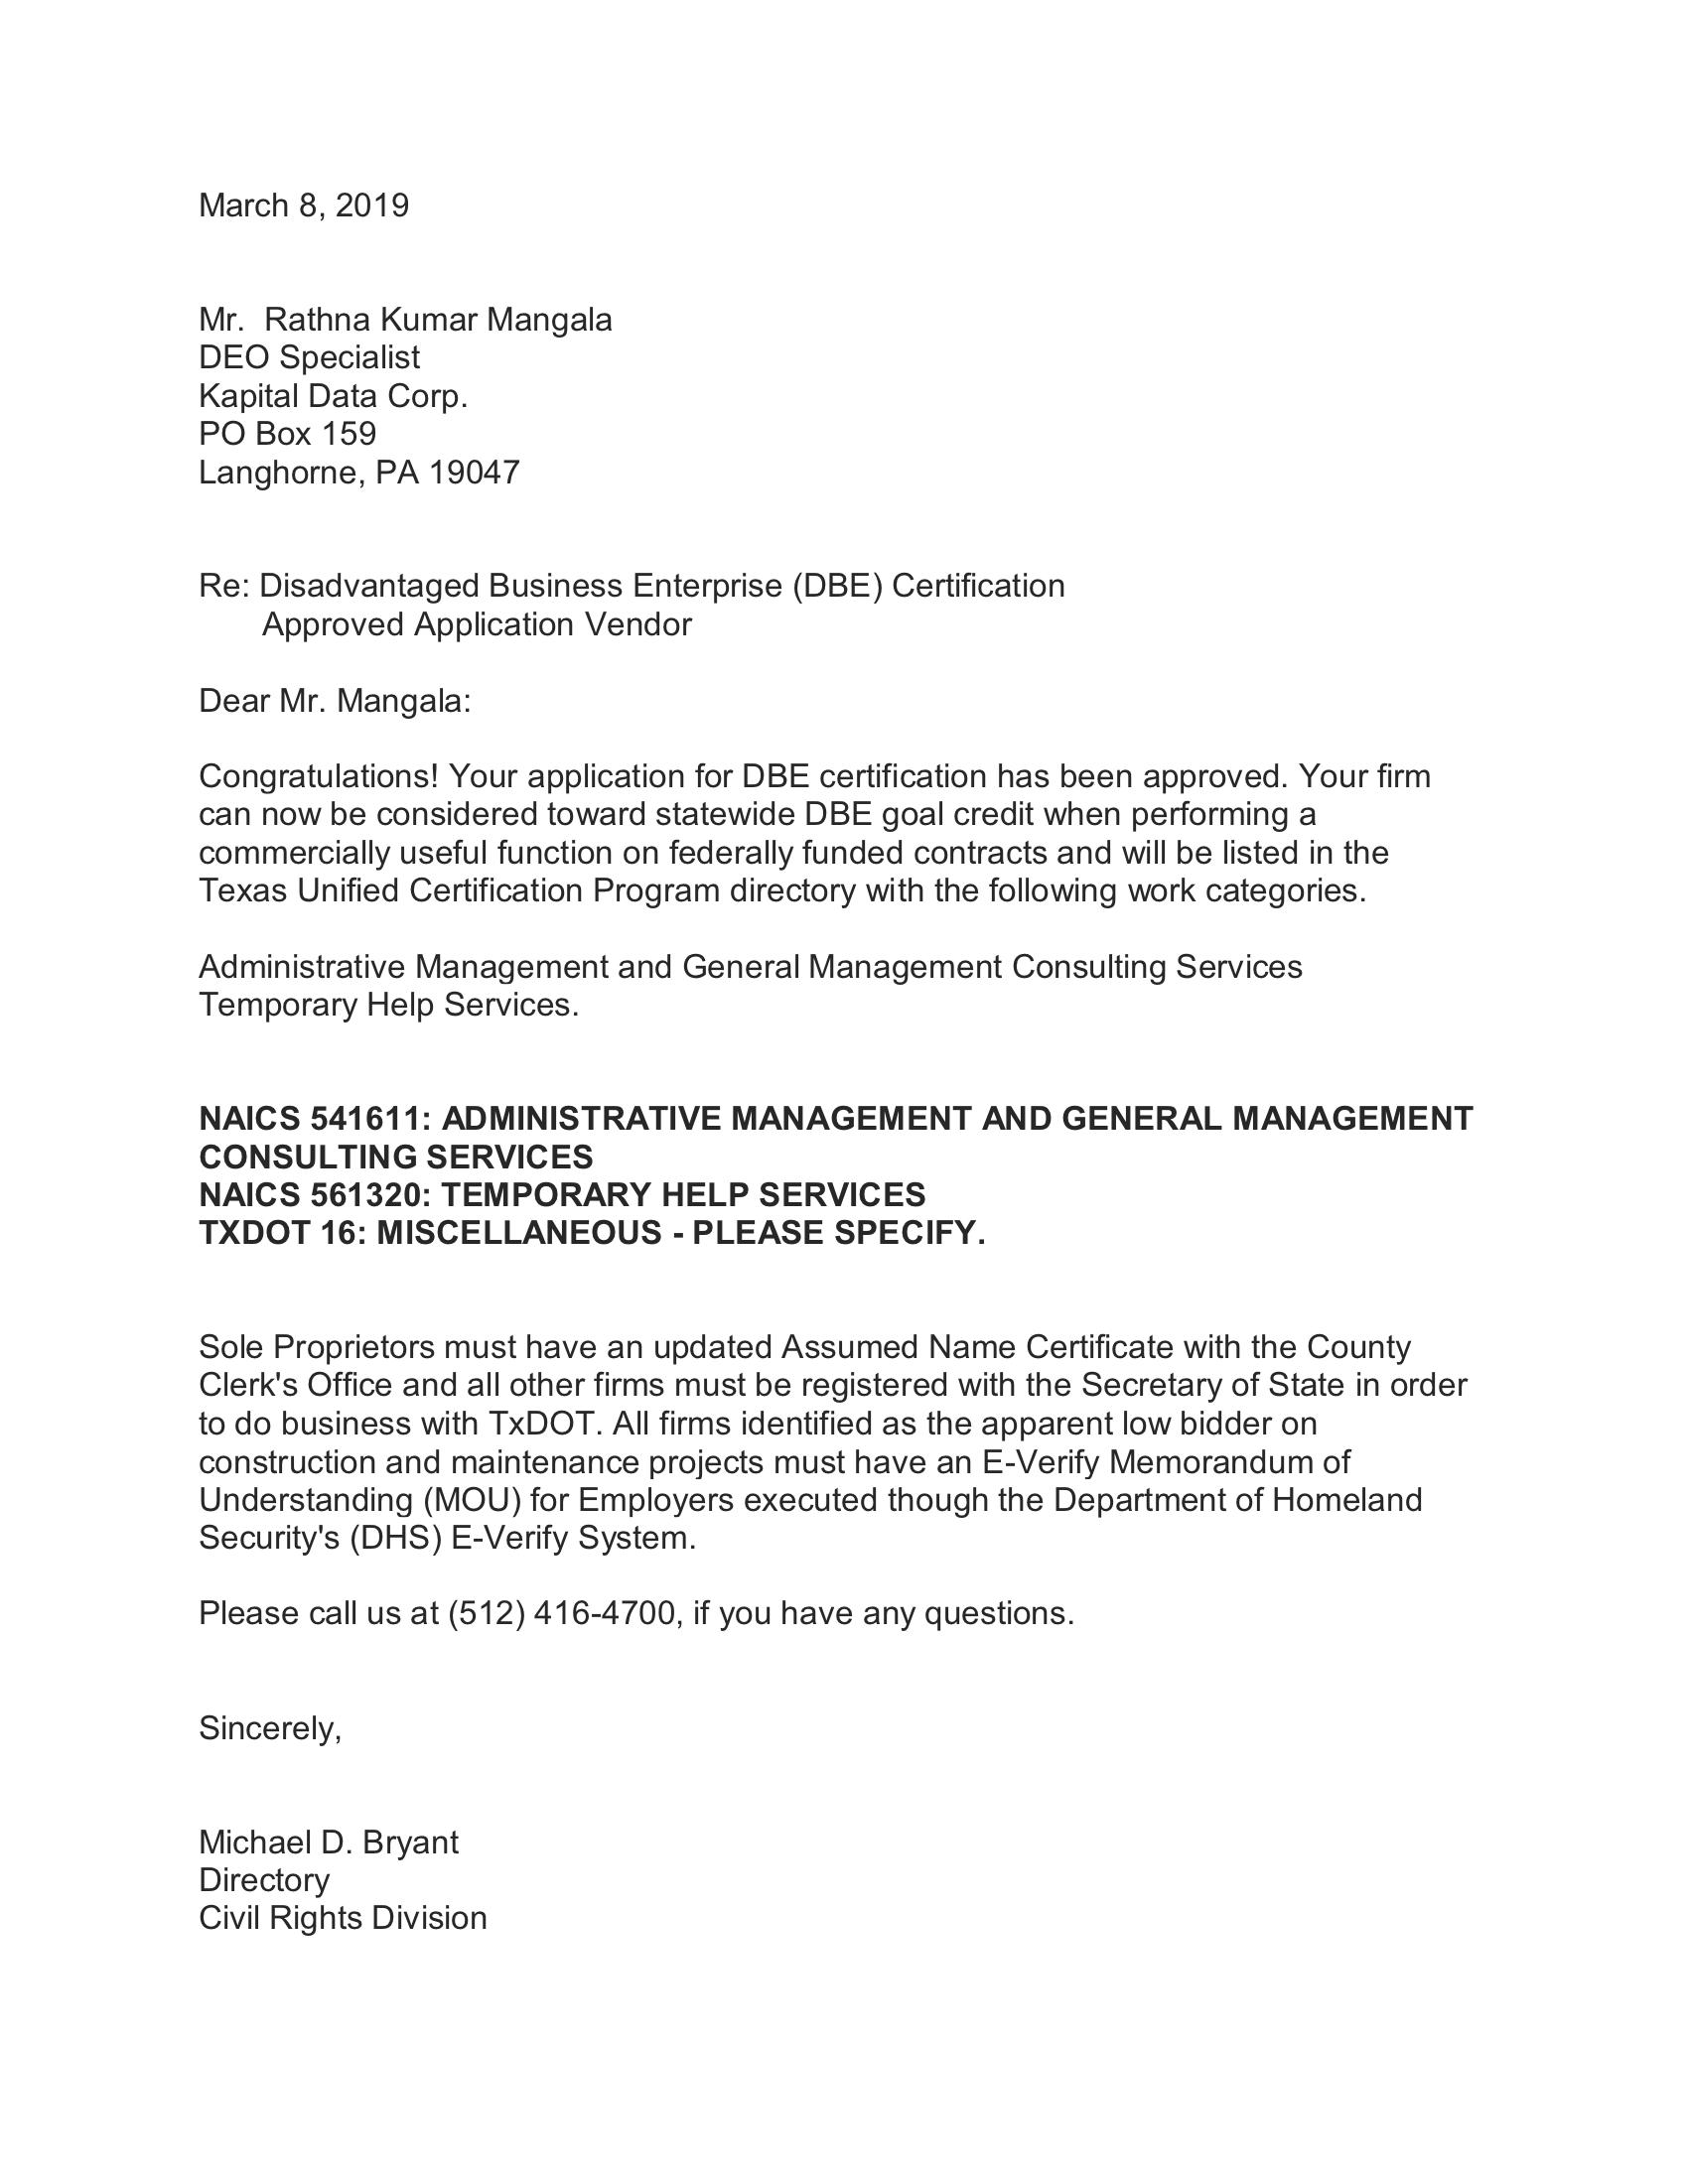 Texas DOT - DBE Certification